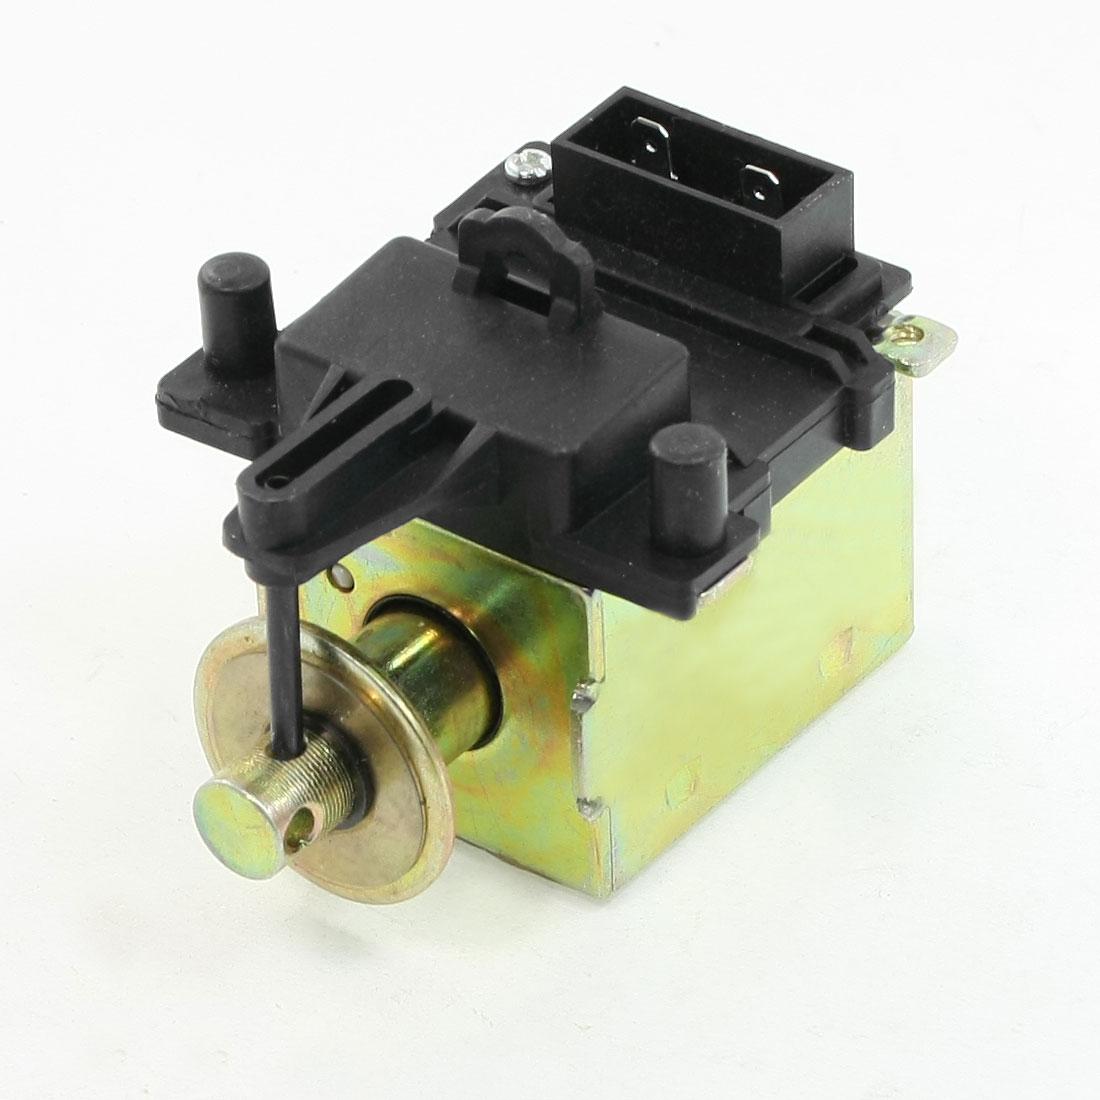 200V 16mm Stroke Water Drain DC Electromagnetic Valve for Xiaotiane Washer